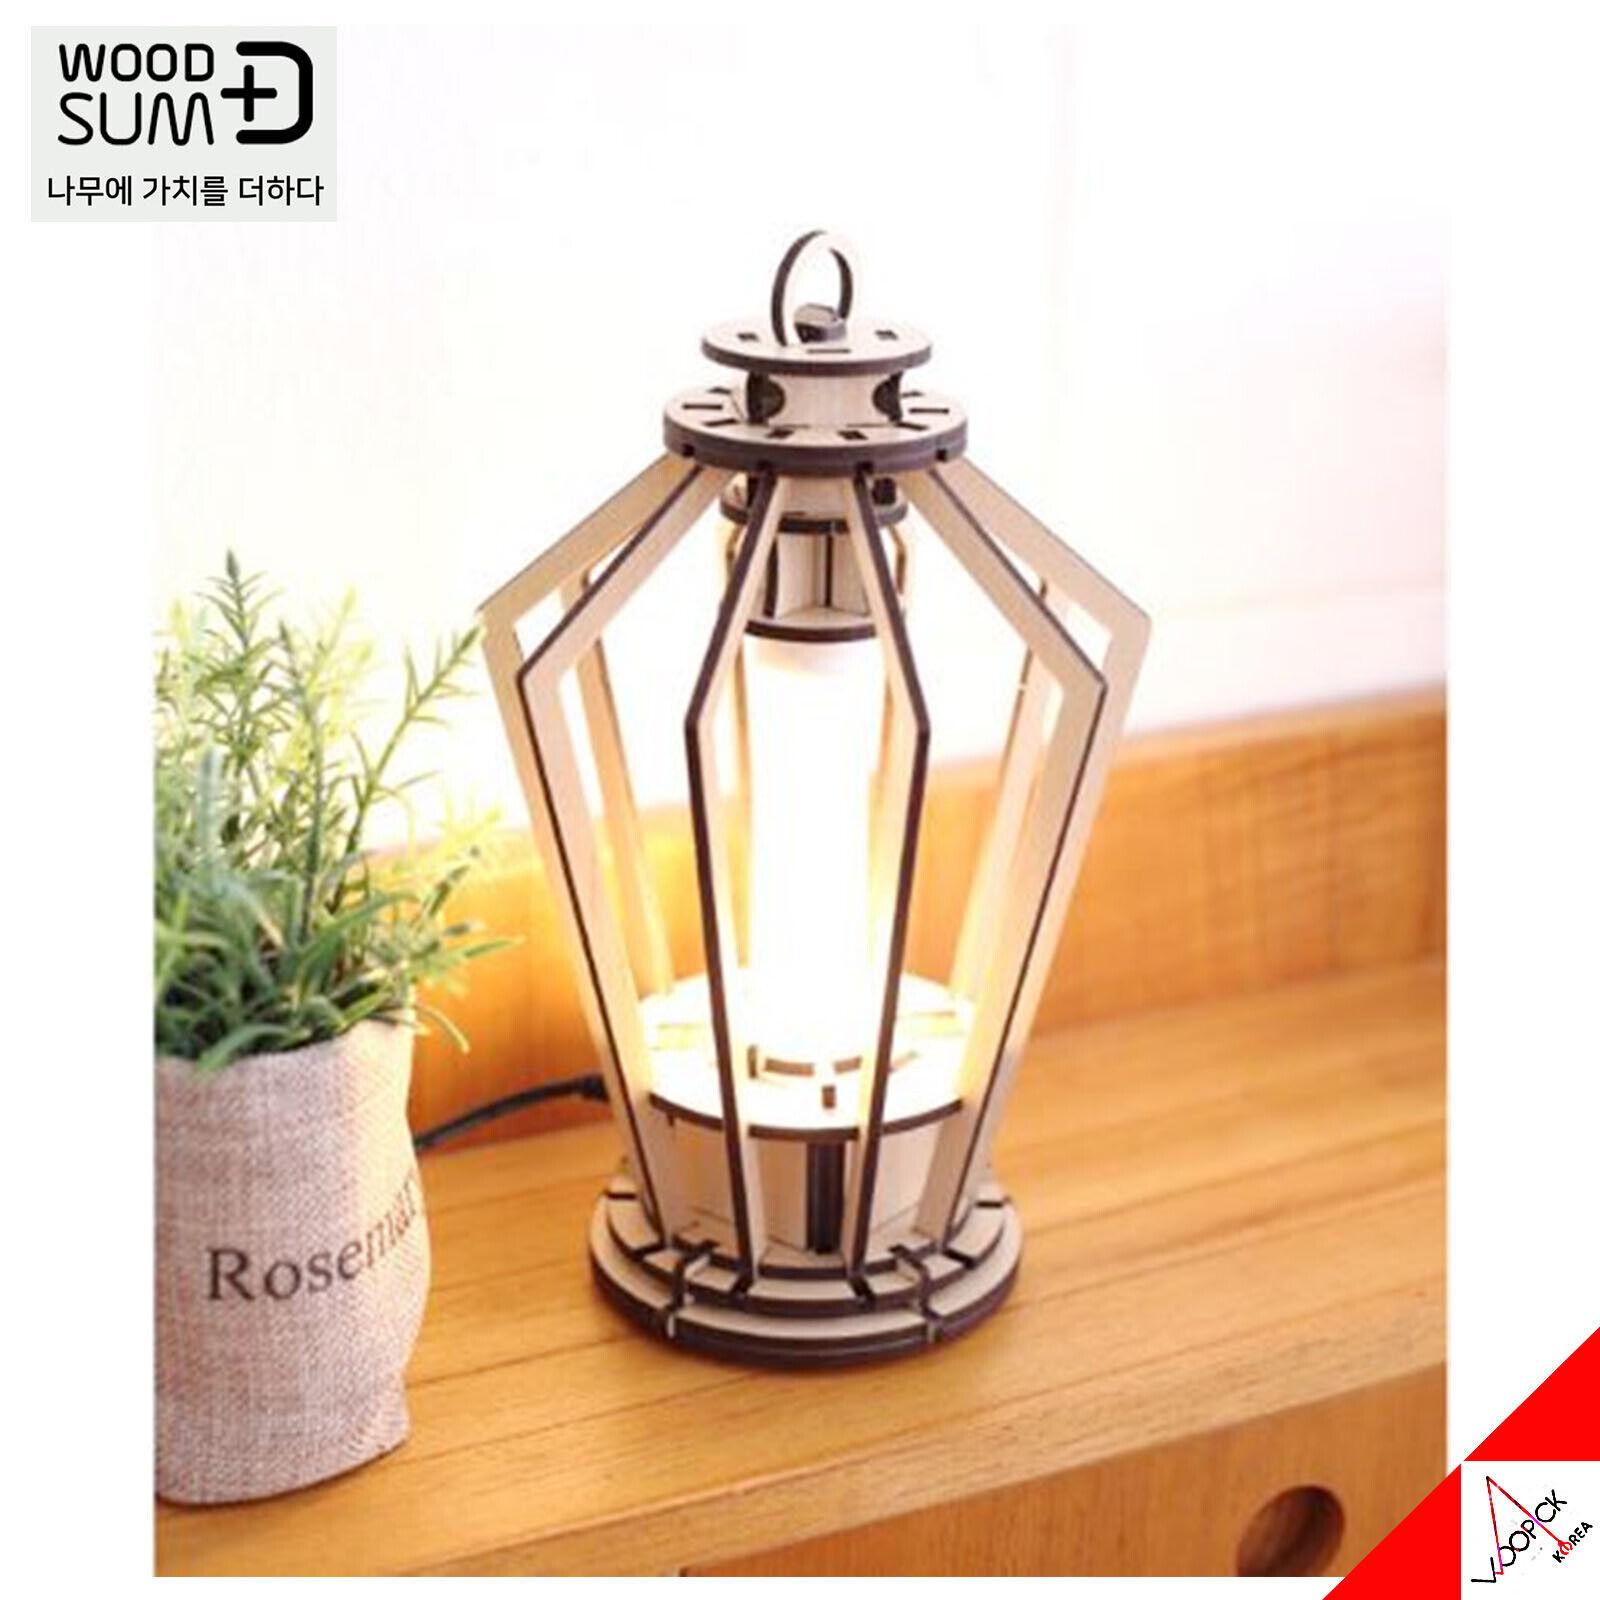 [WOODSUM] LED Retro Vintage DIY Wood Lamp-M  Self Assembly Kit - Home Decor